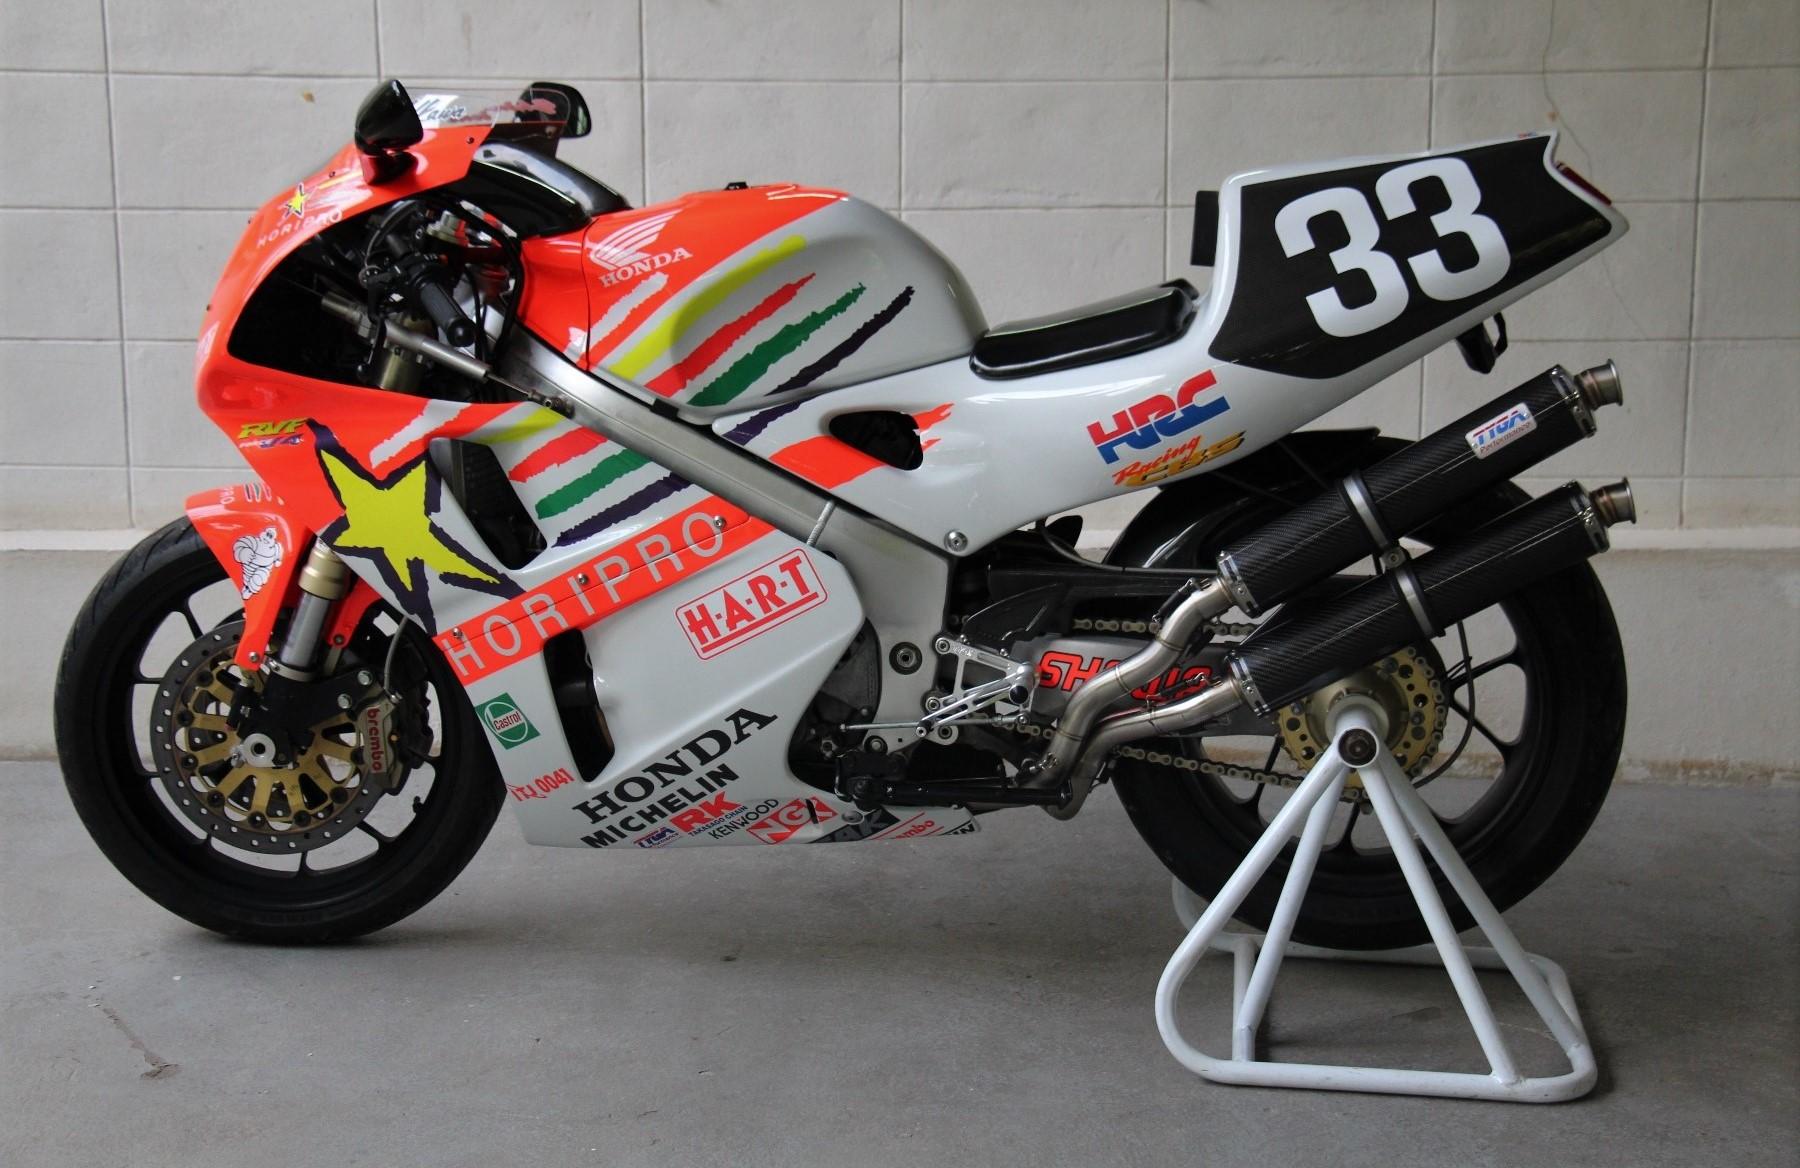 Тест-драйв мотоцикла Honda VFR400